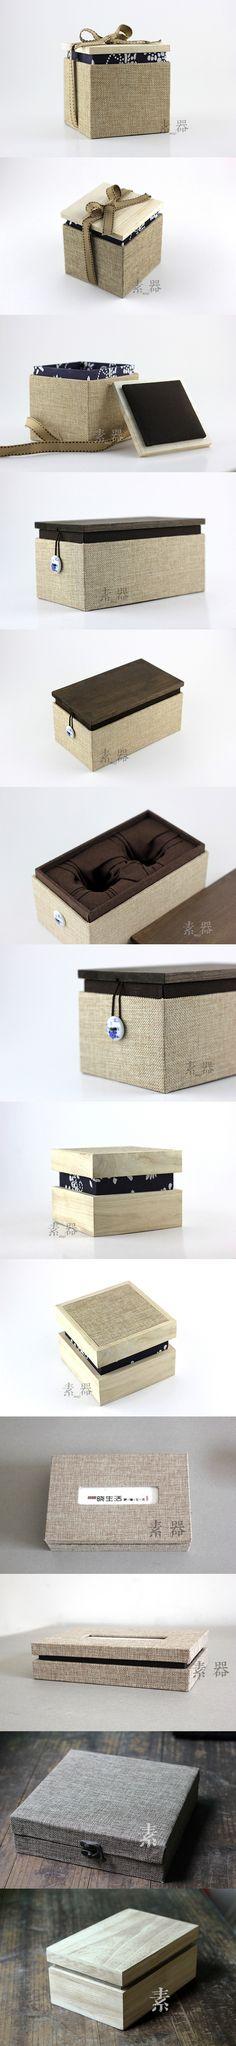 Packaging / box